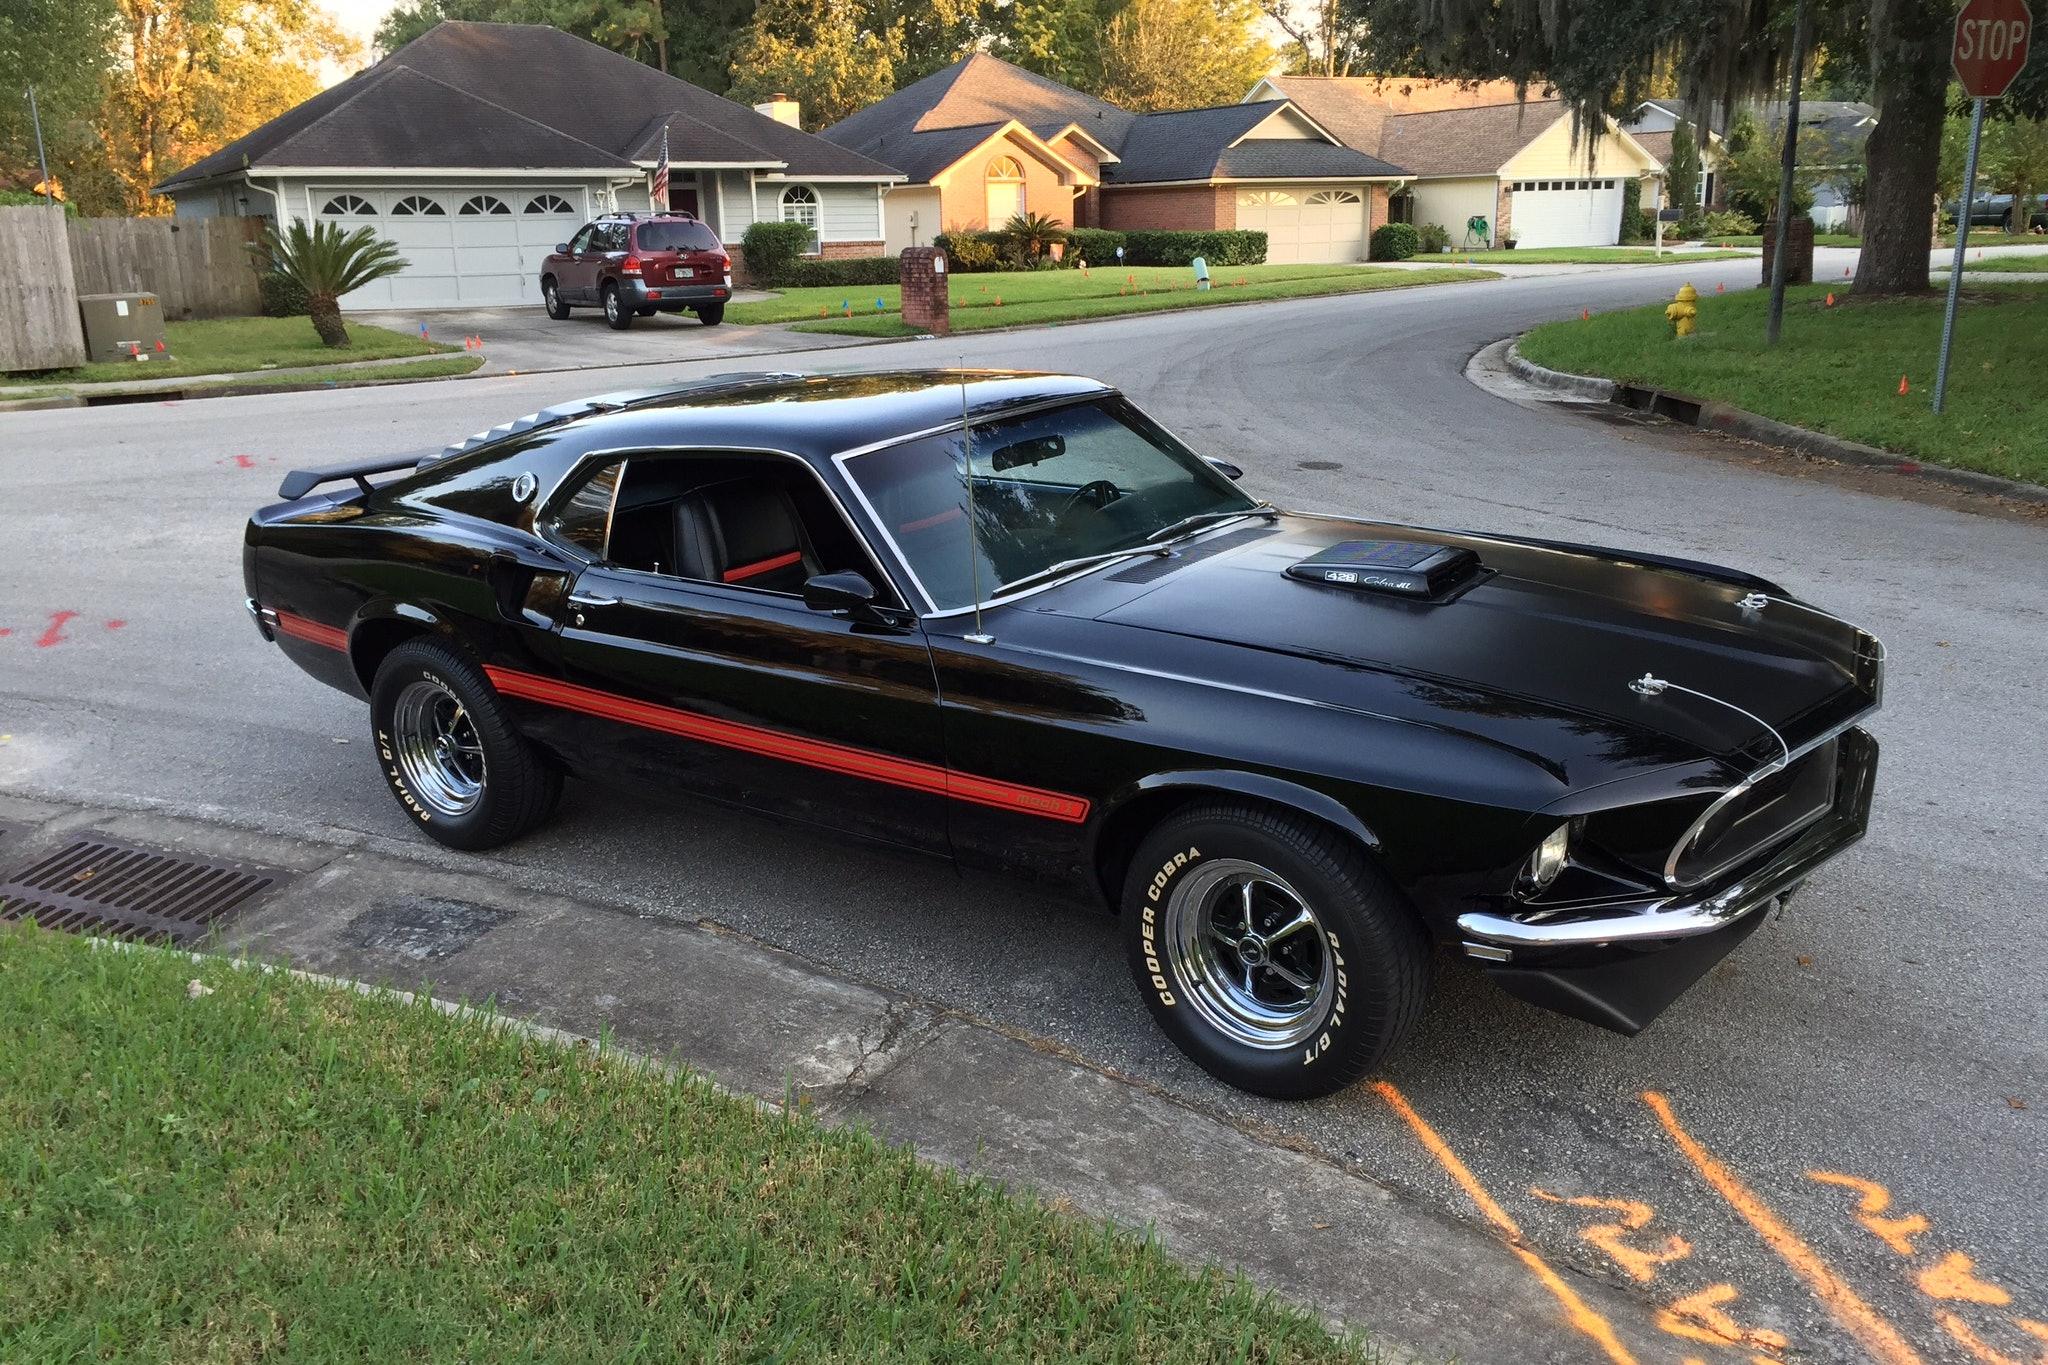 1969 Ford Mustang Mach1 428 CJ